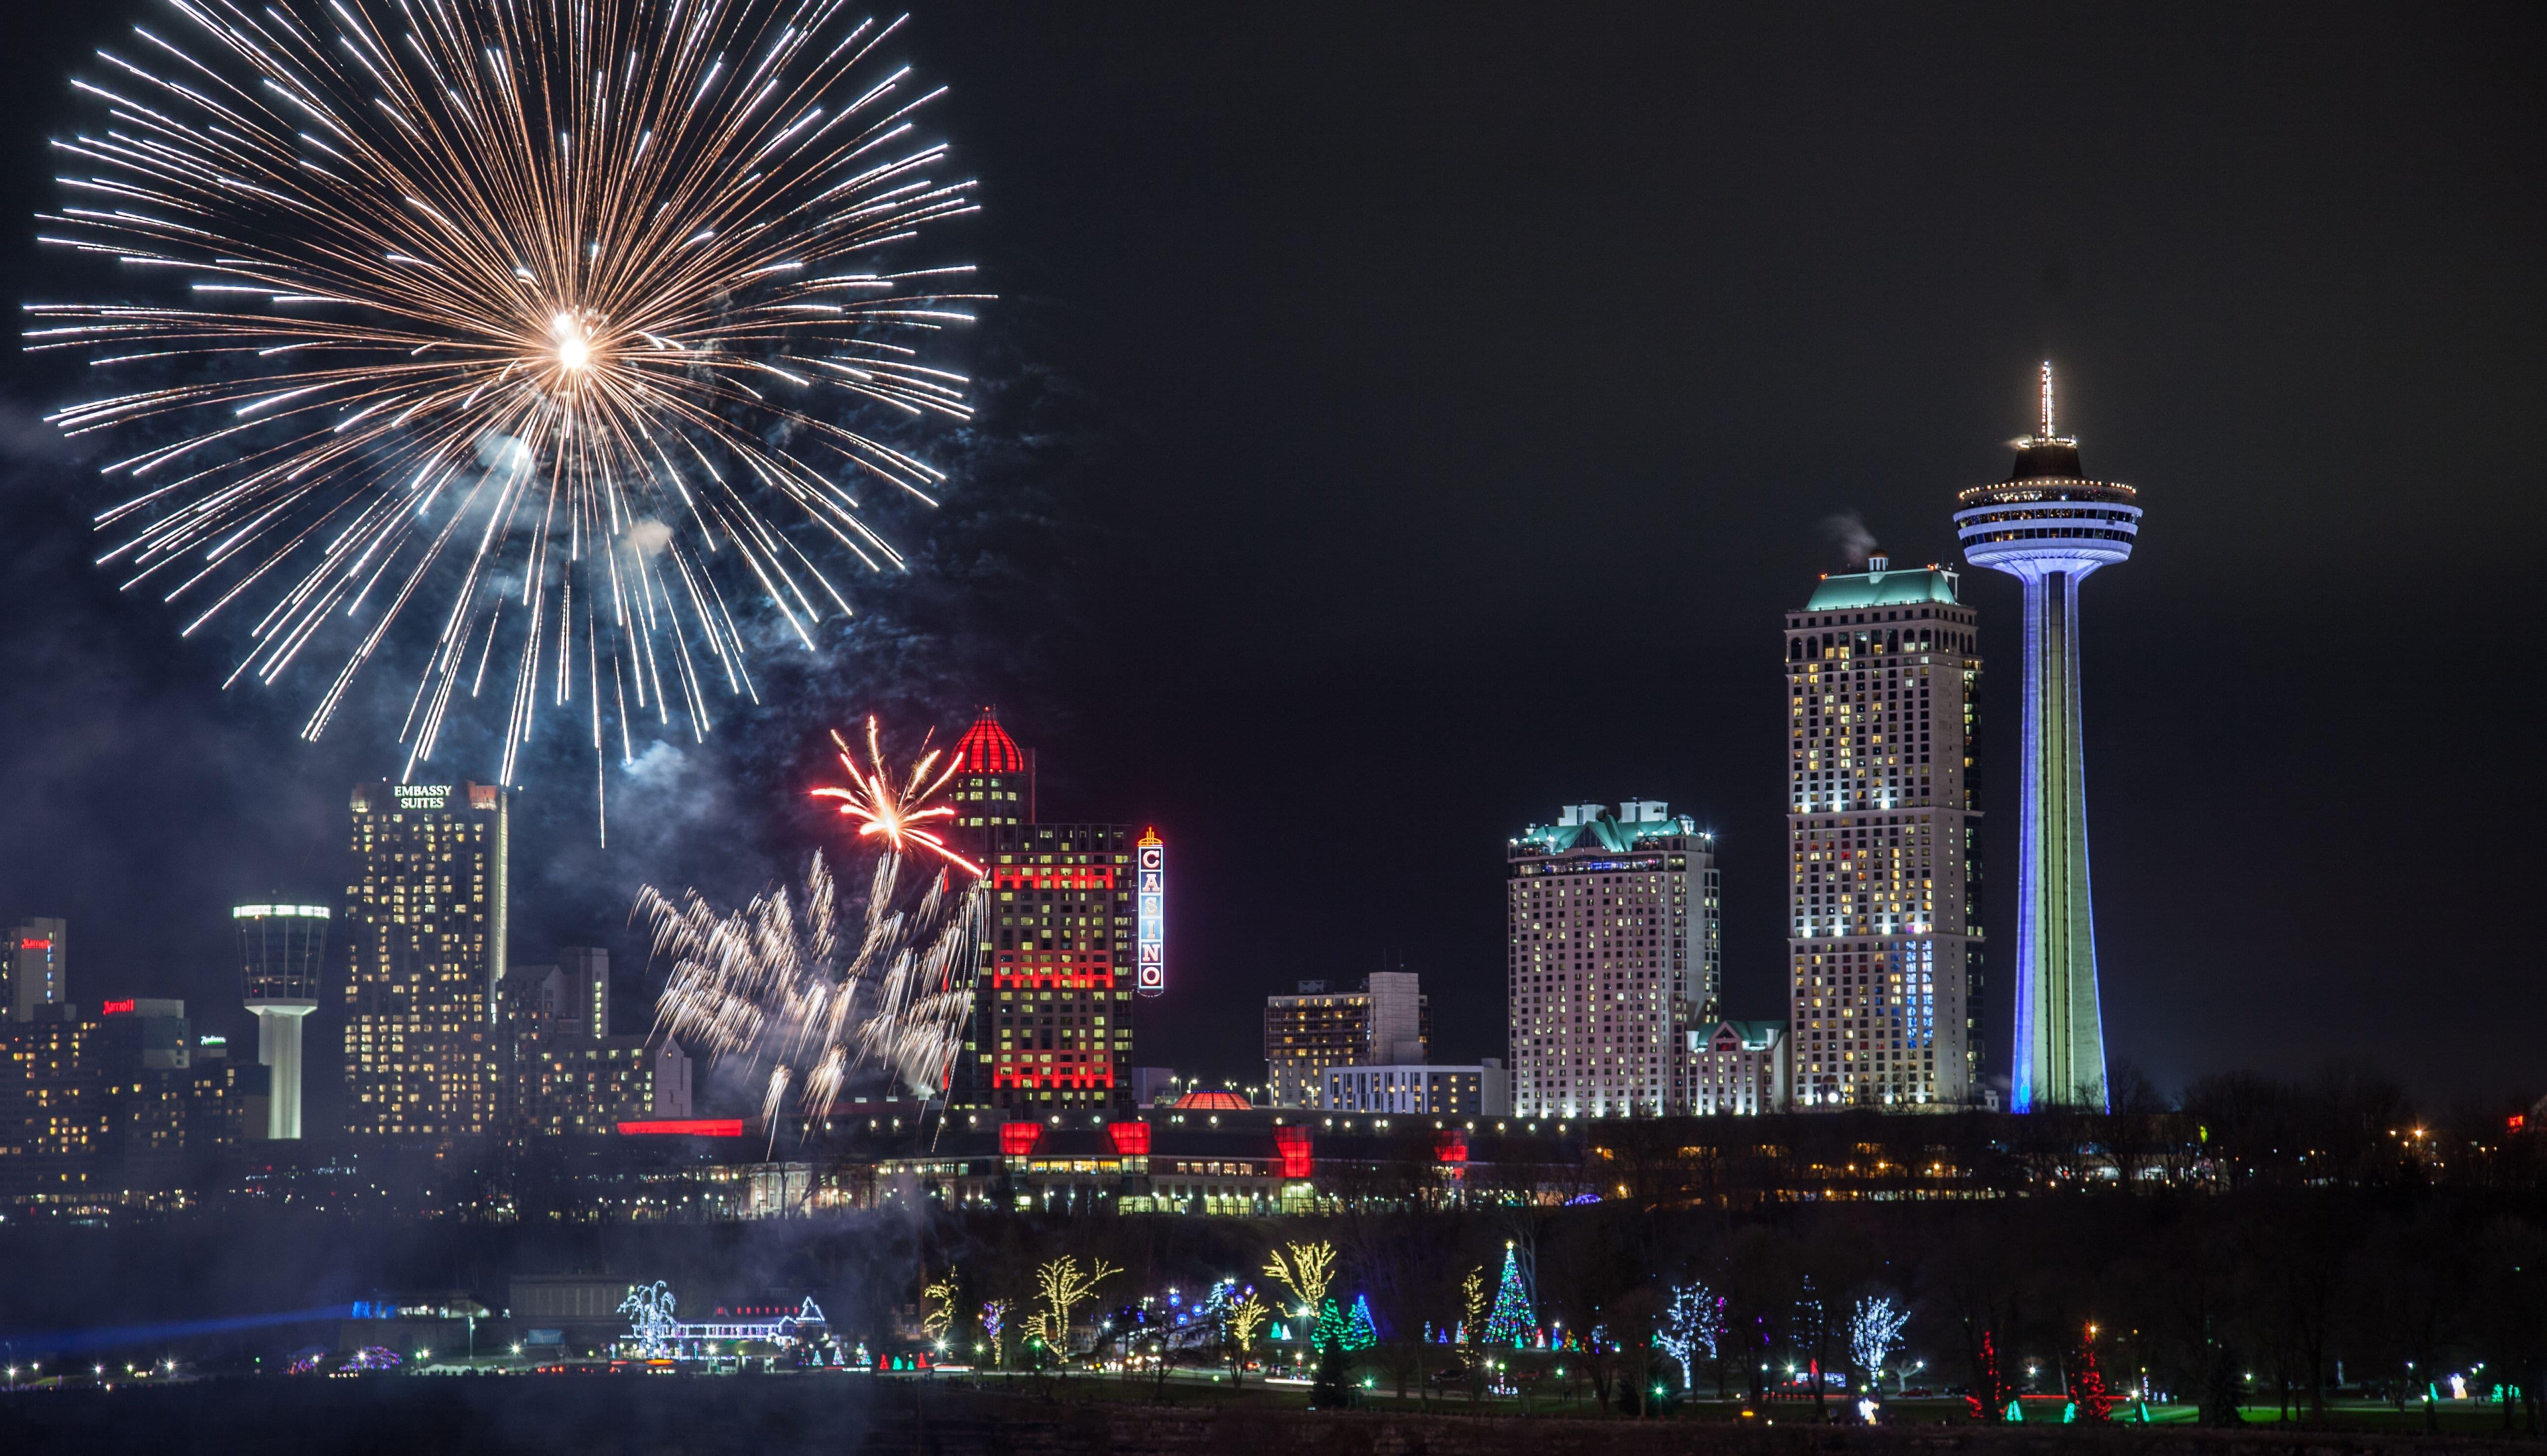 2019 20 Niagara Falls Opg Winter Fireworks Series Presented